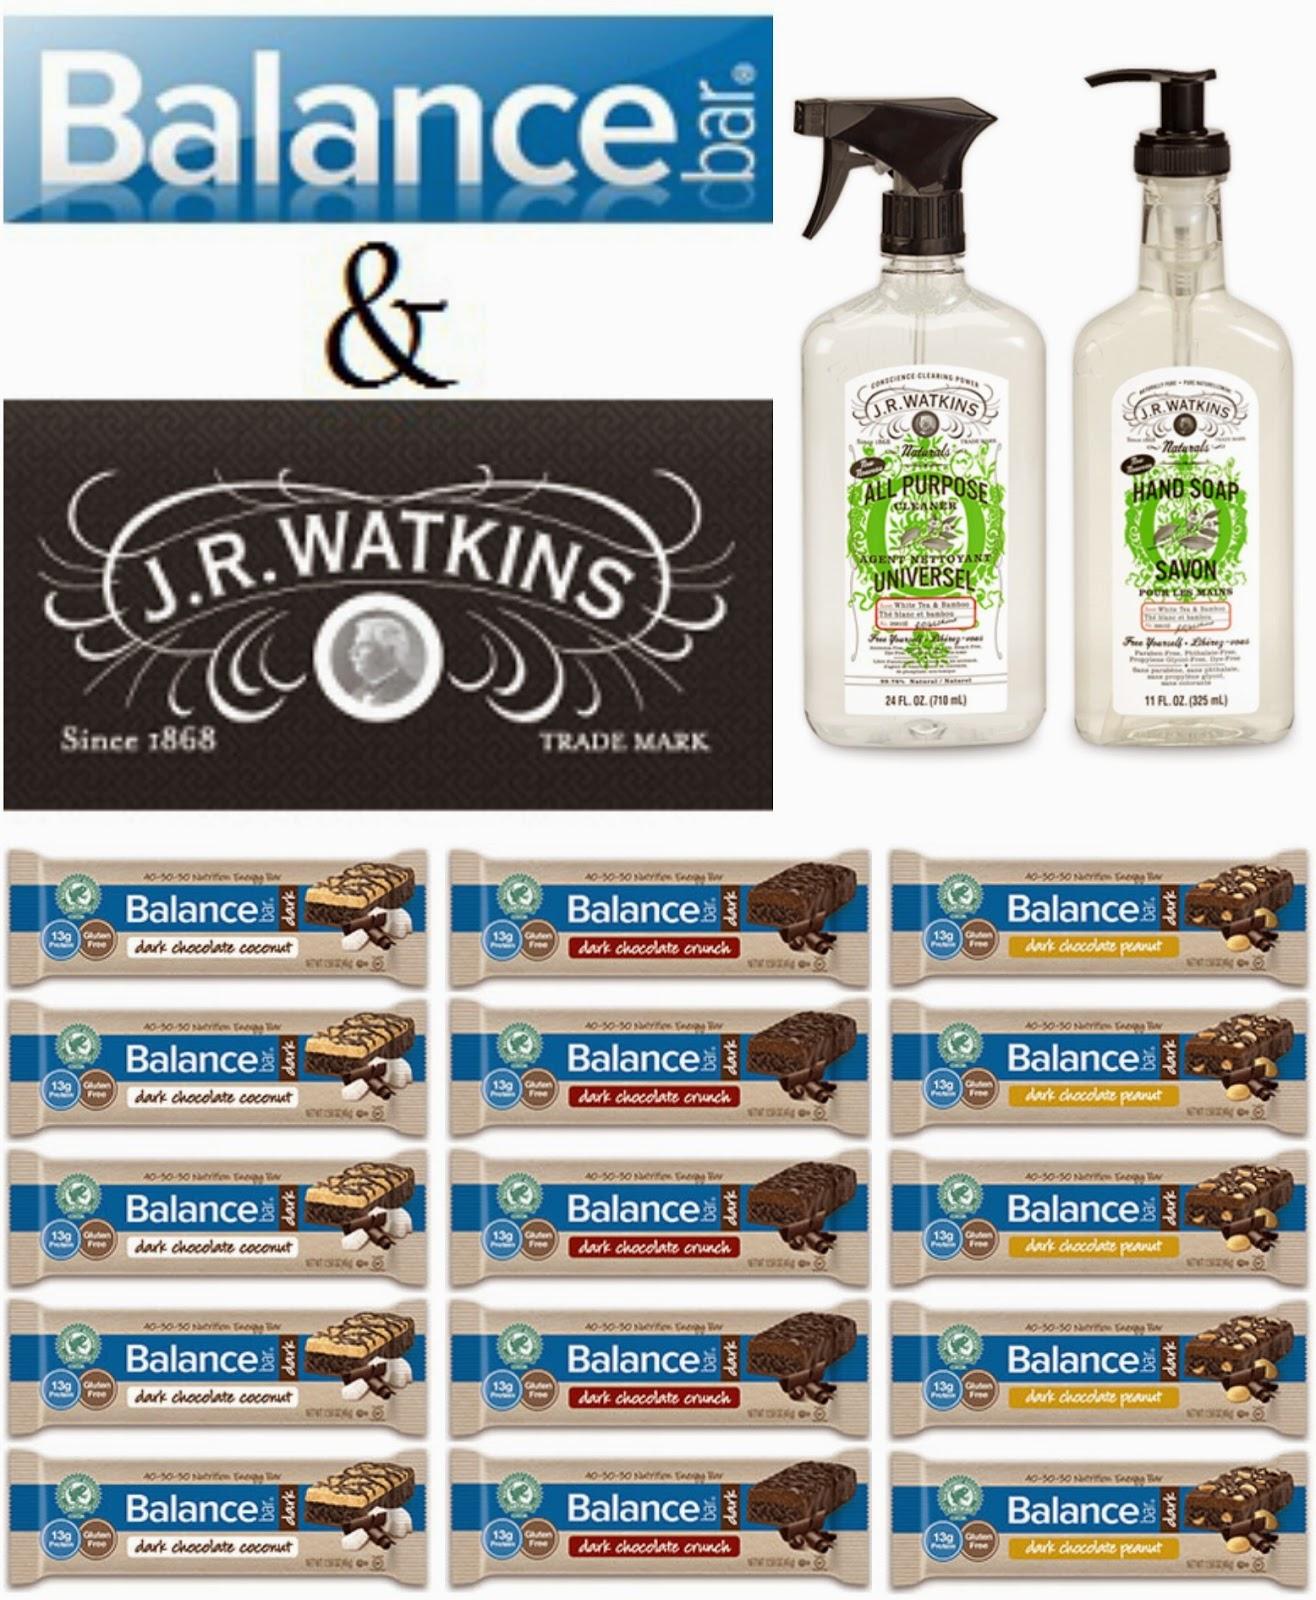 Balance Bar JR Watkins